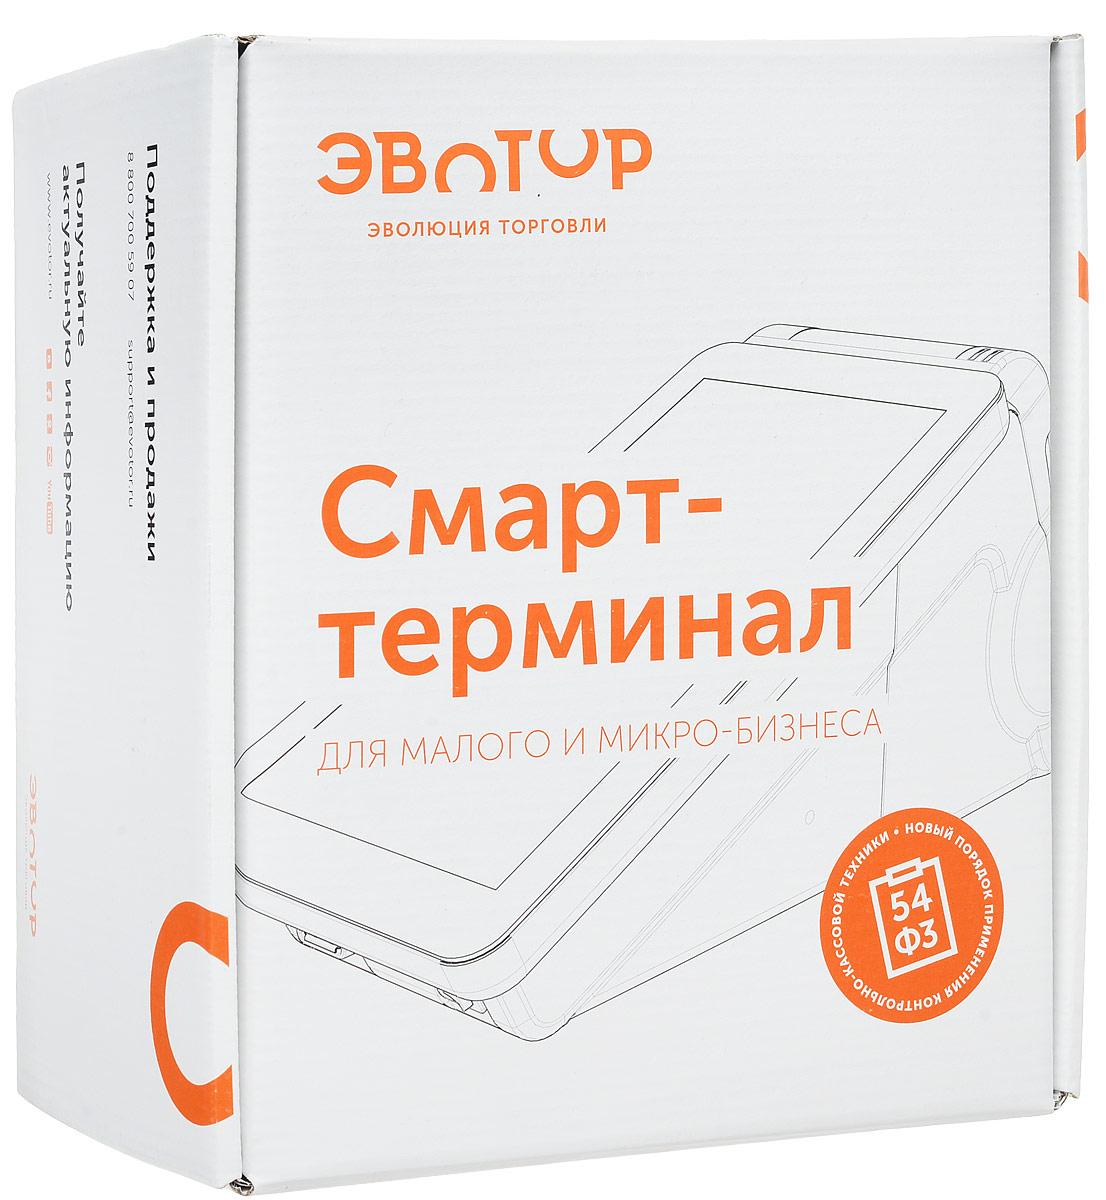 Эвотор ФН смарт-терминал Эвотор